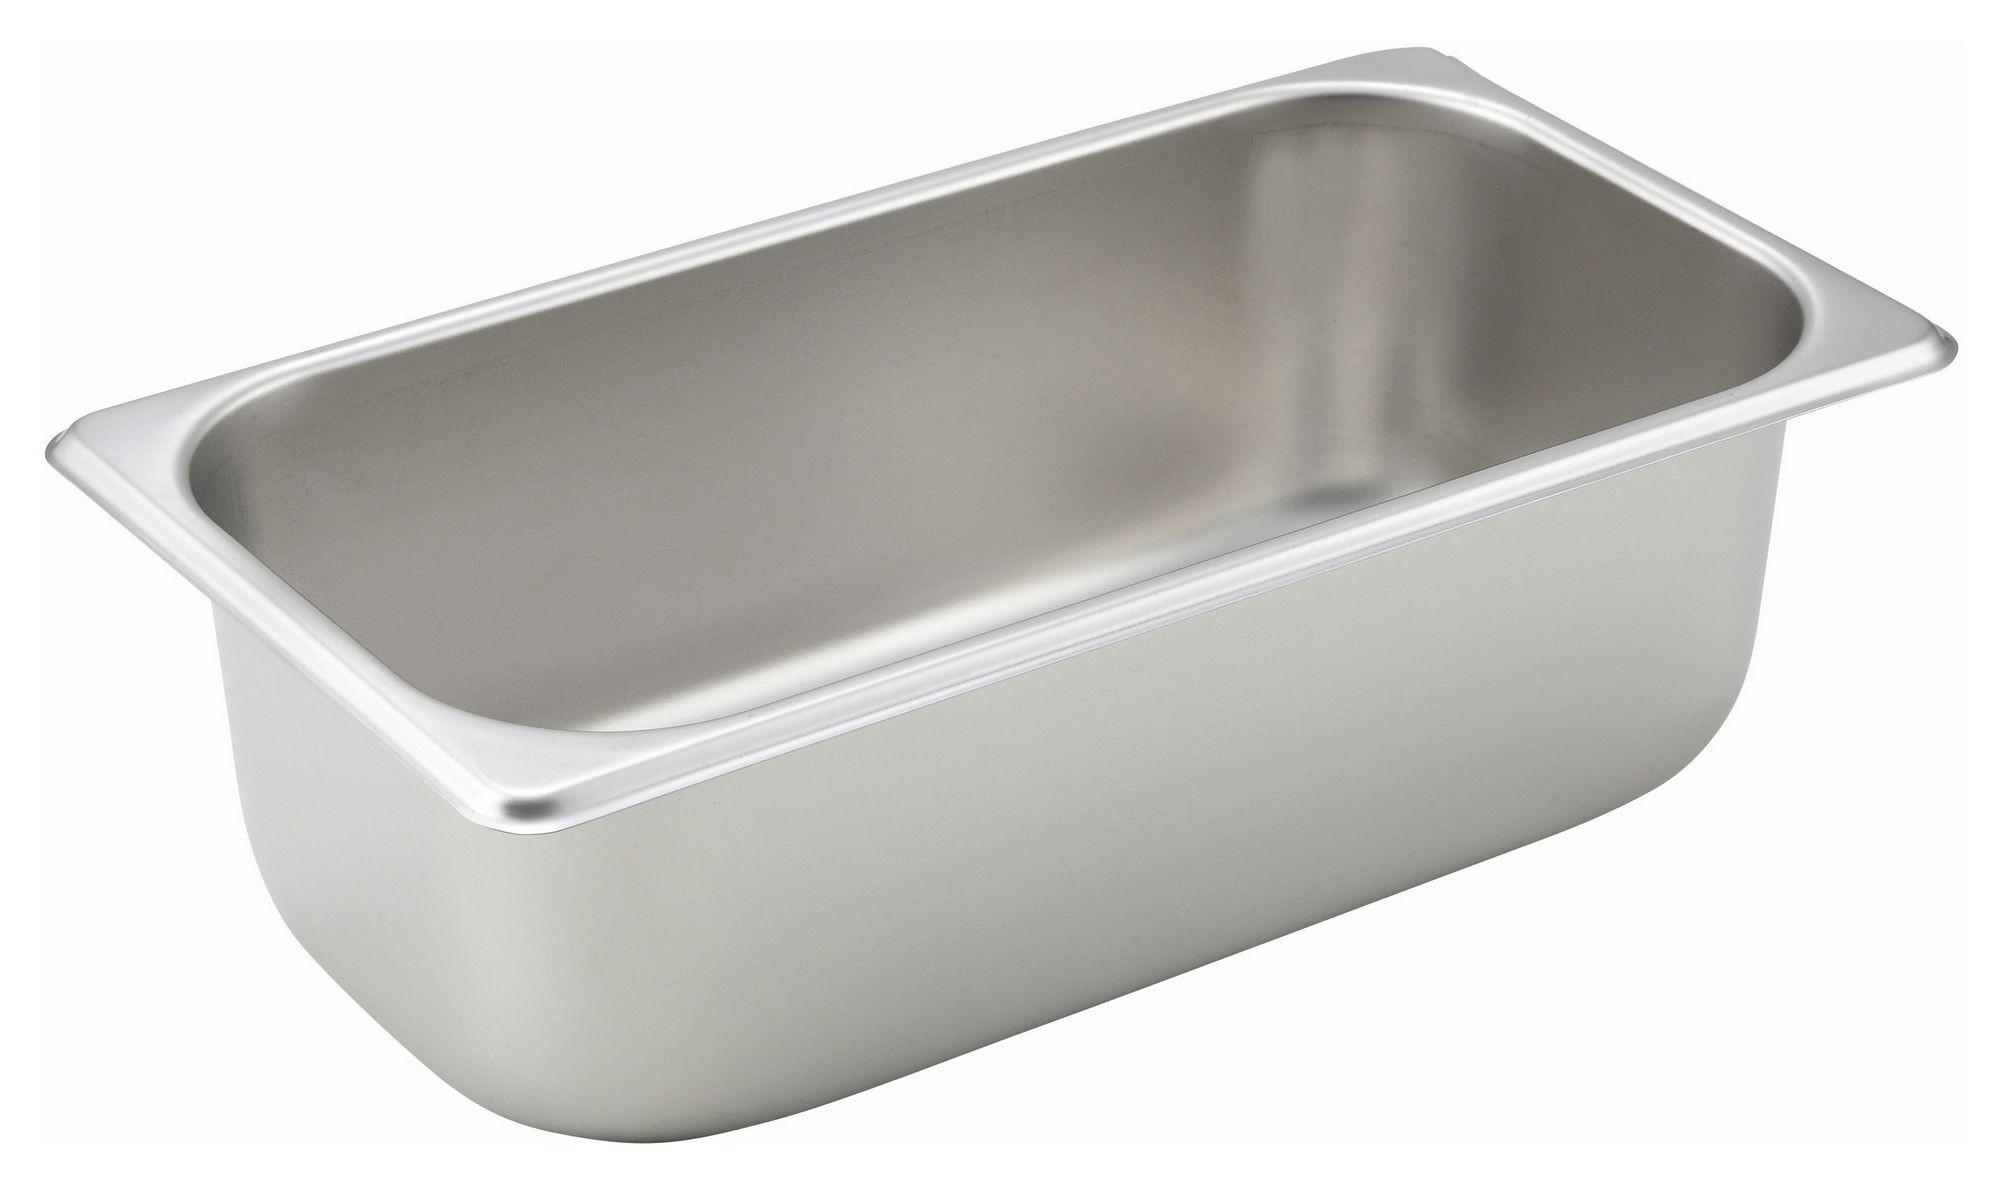 "Winco SPT4 1/3 Size Standard Weight Steam Table Pan 4"" Deep"